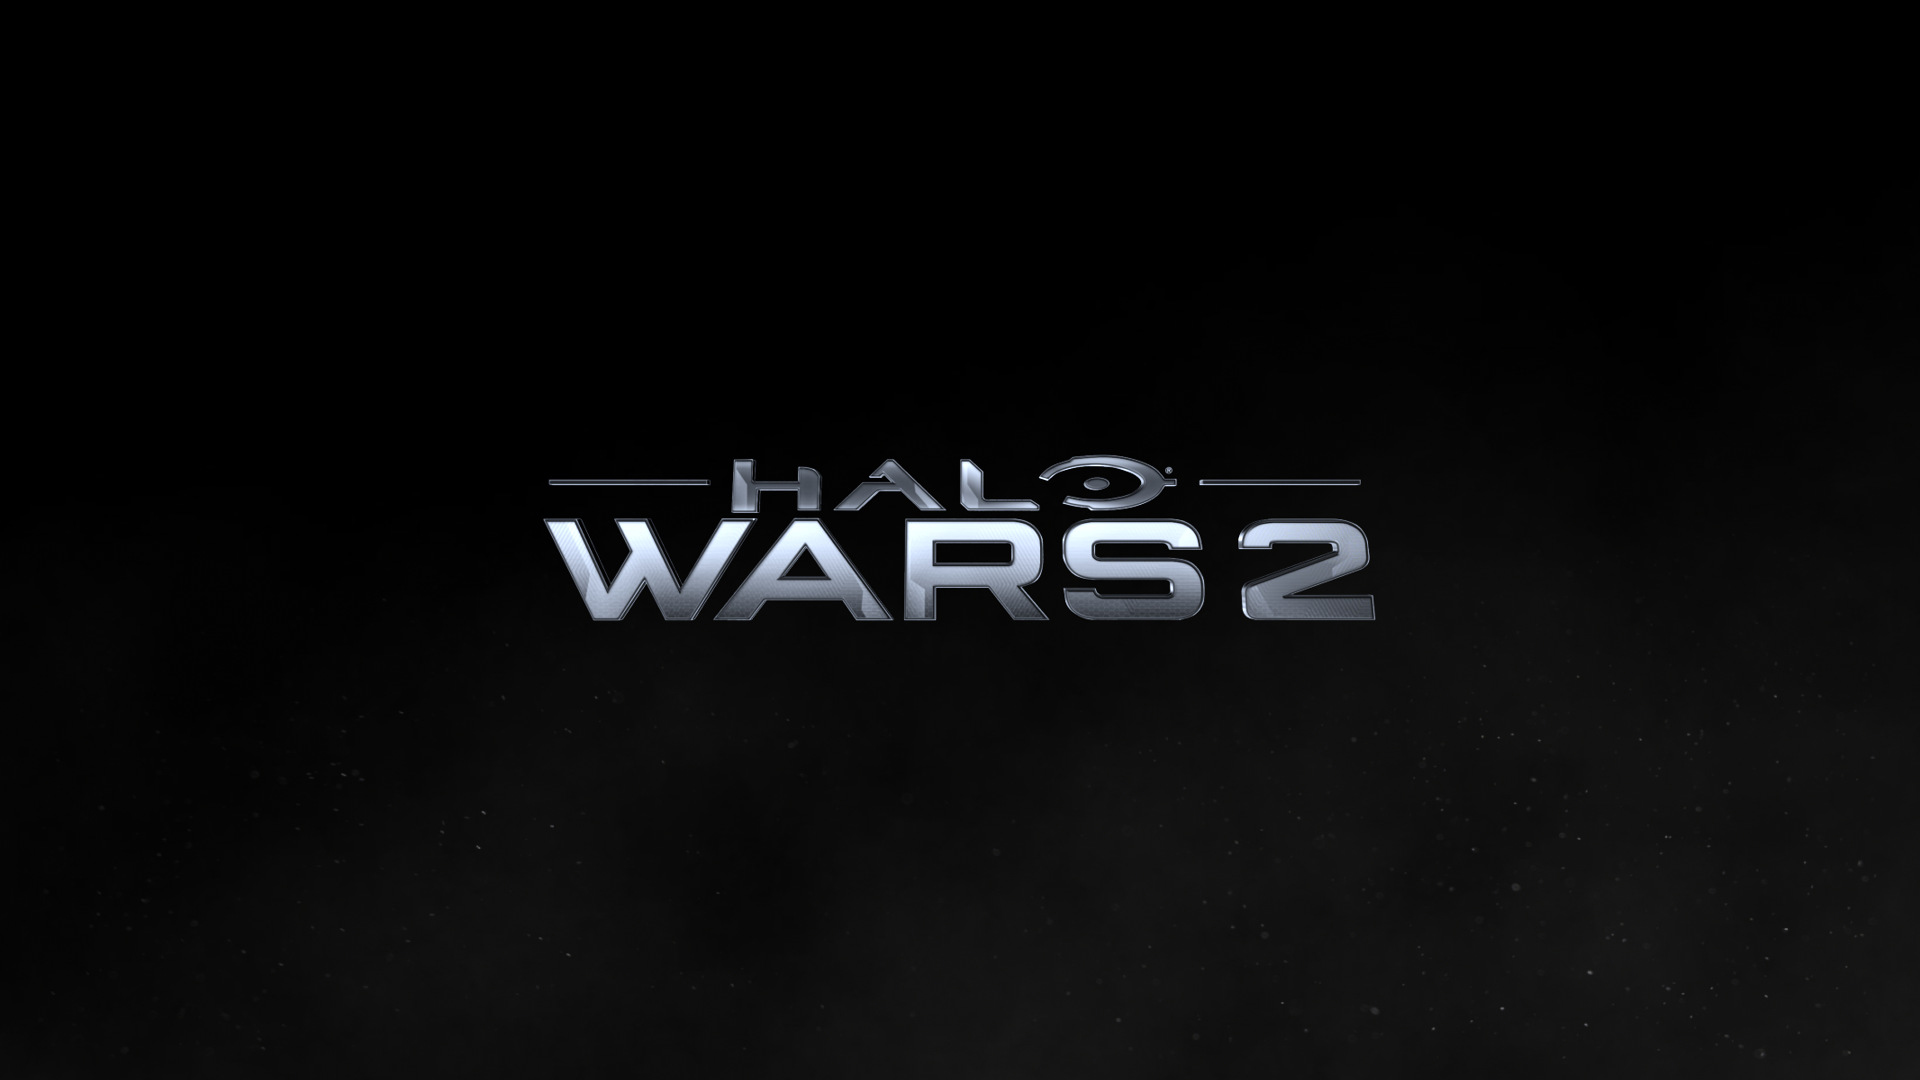 Halo-Wars-2-Logo-jpg